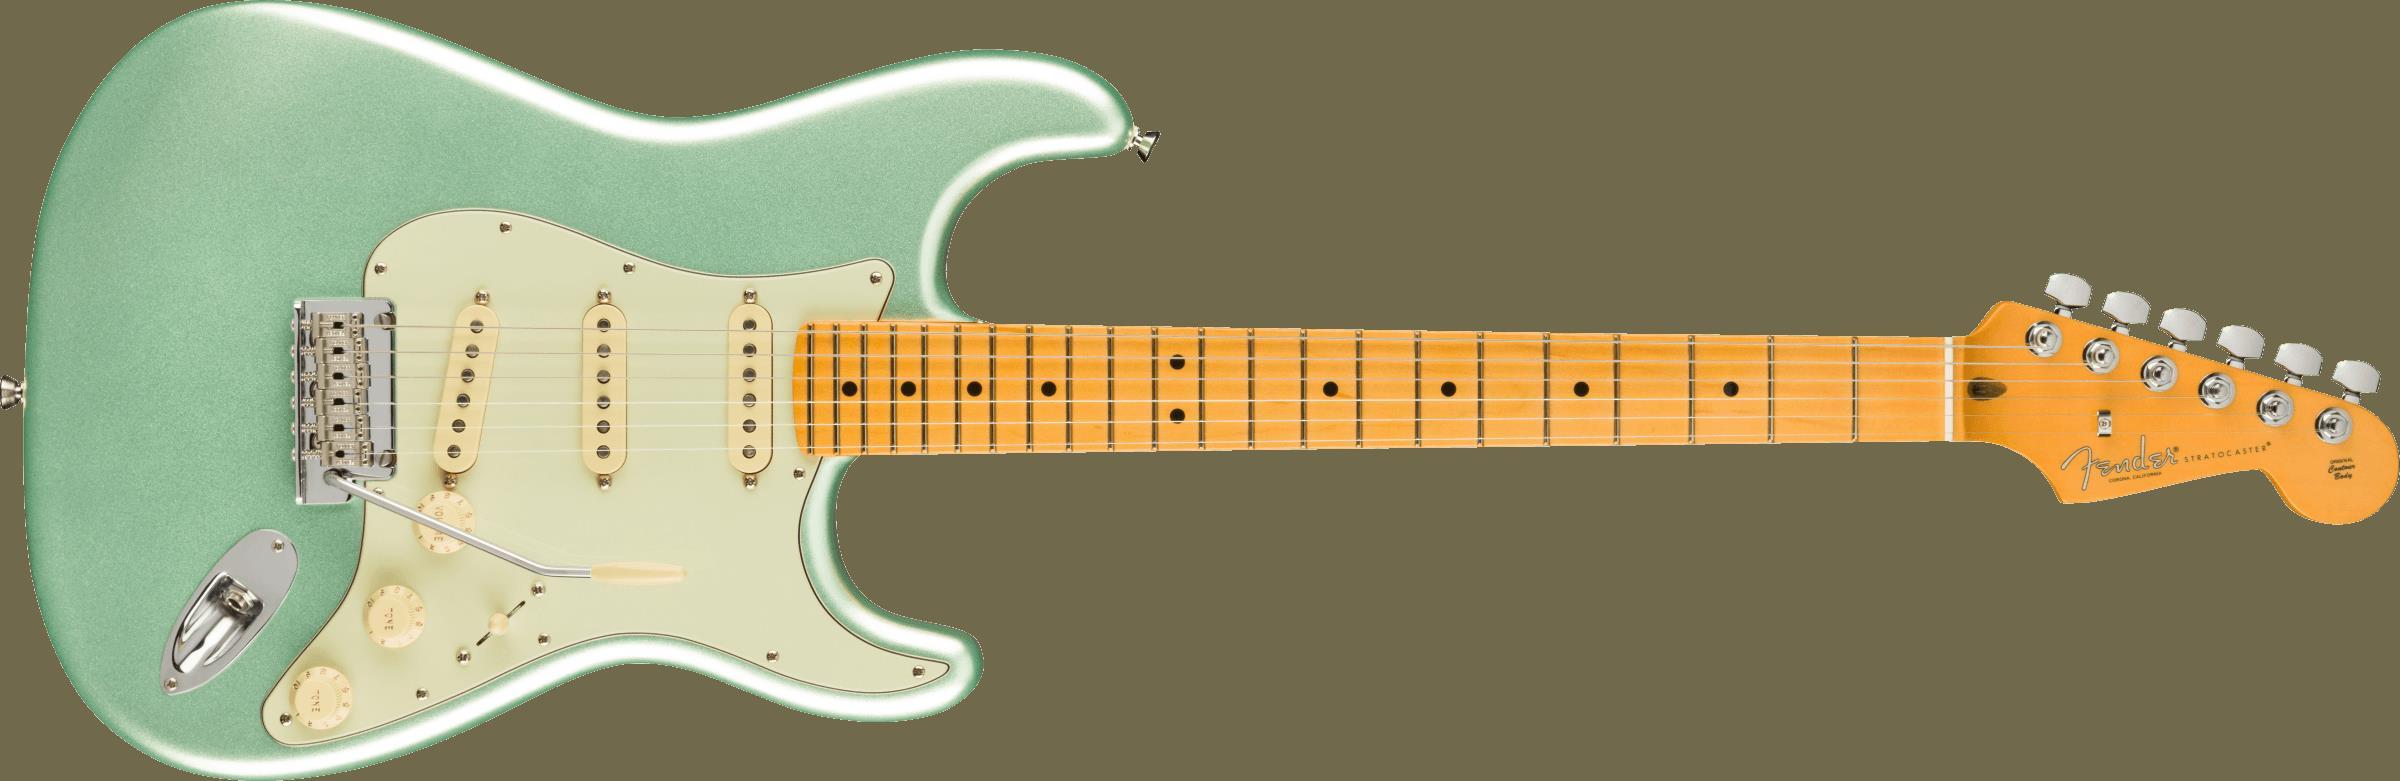 FENDER-American-Professional-II-Stratocaster-MN-Mystic-Surf-Green-0113902718-sku-24079